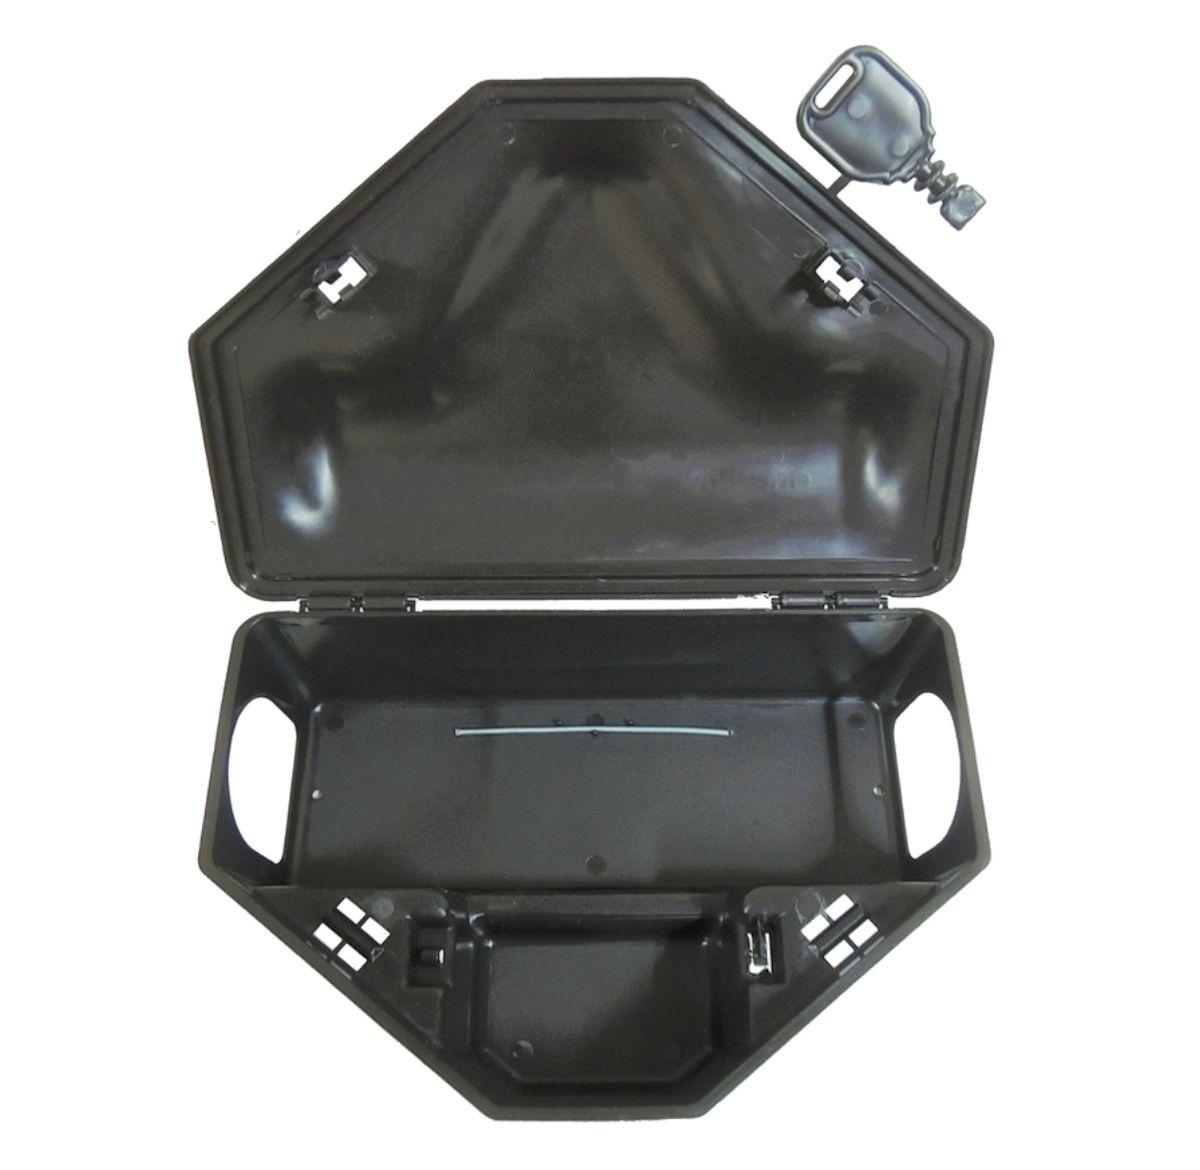 Kit 28 Porta Isca Com 2 Chaves - Duplo Travamento